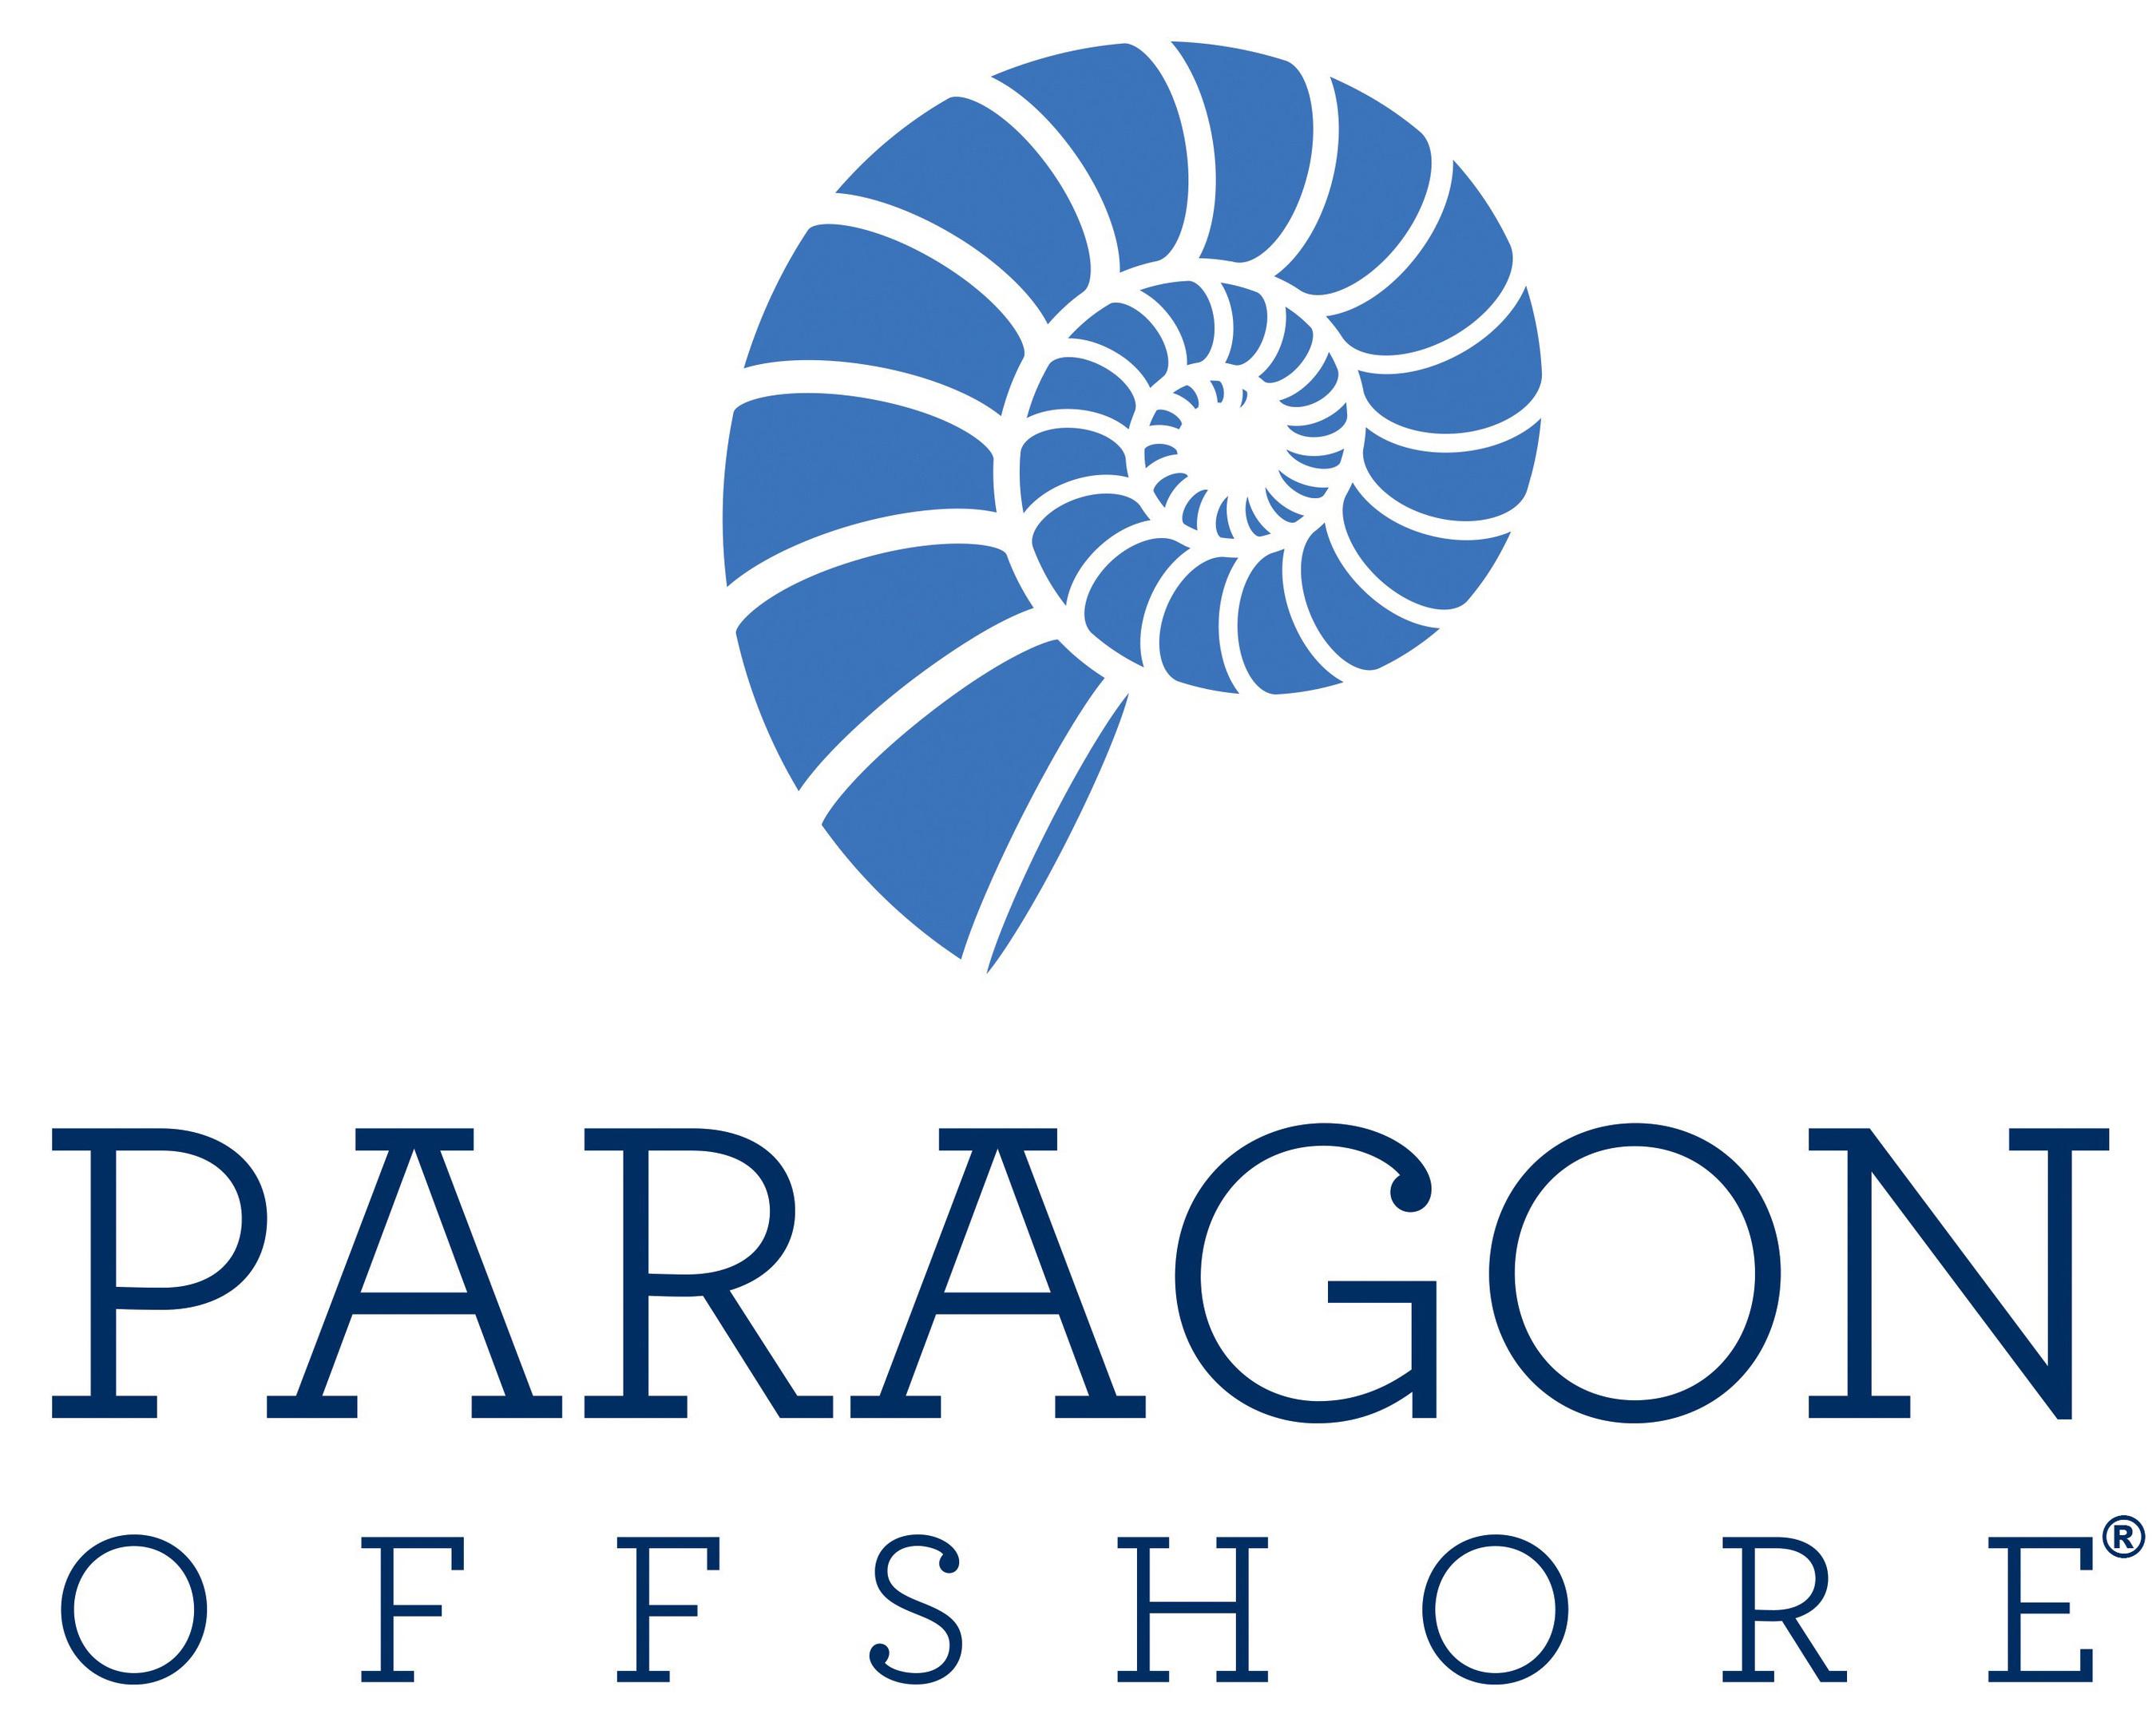 Paragon Offshore plc Logo (PRNewsFoto/Paragon Offshore plc)